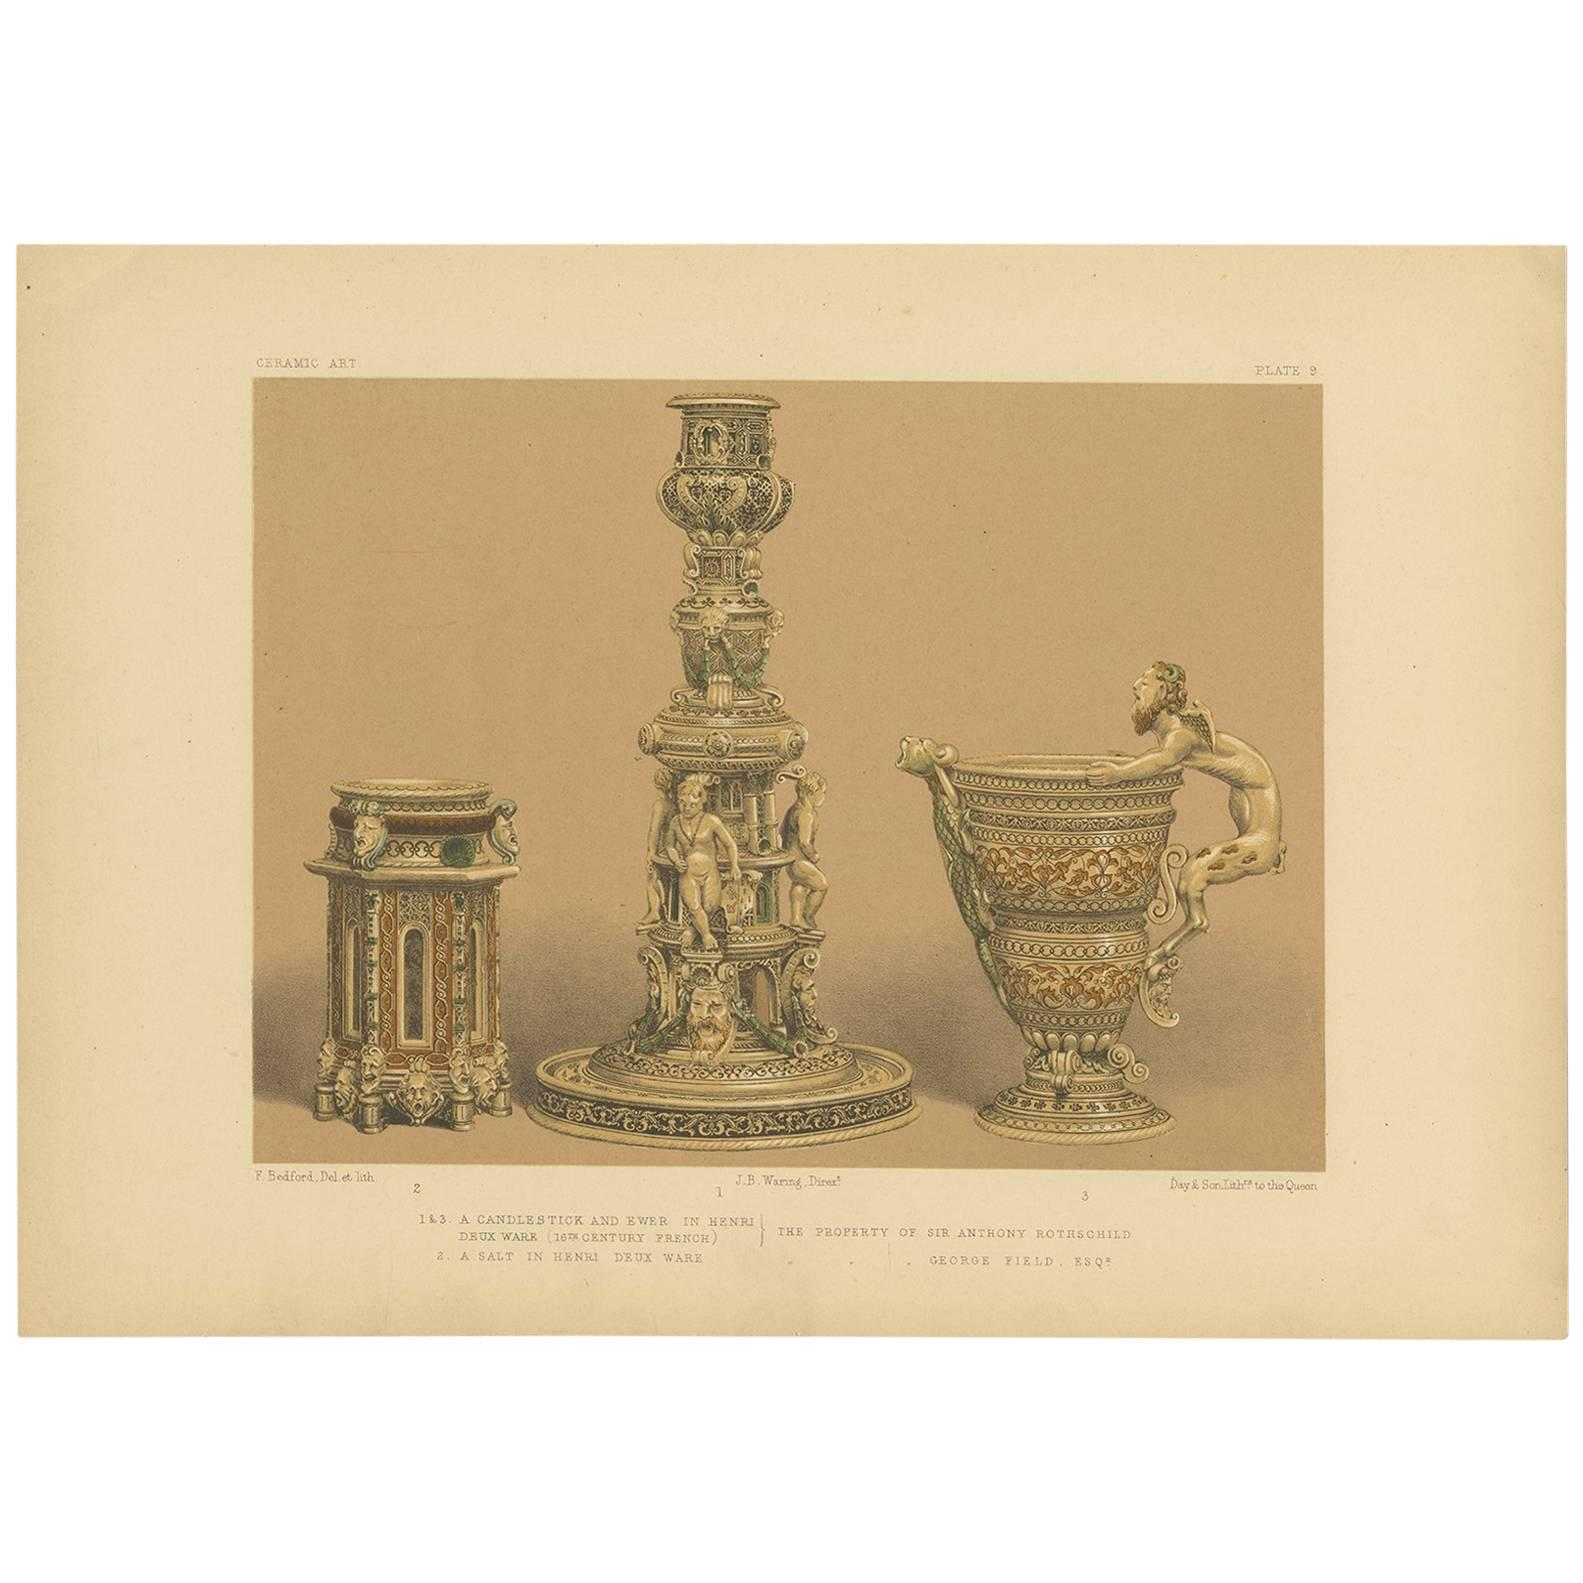 Pl. 9 Antique Print of Henri Deux Ware by Bedford, circa 1857